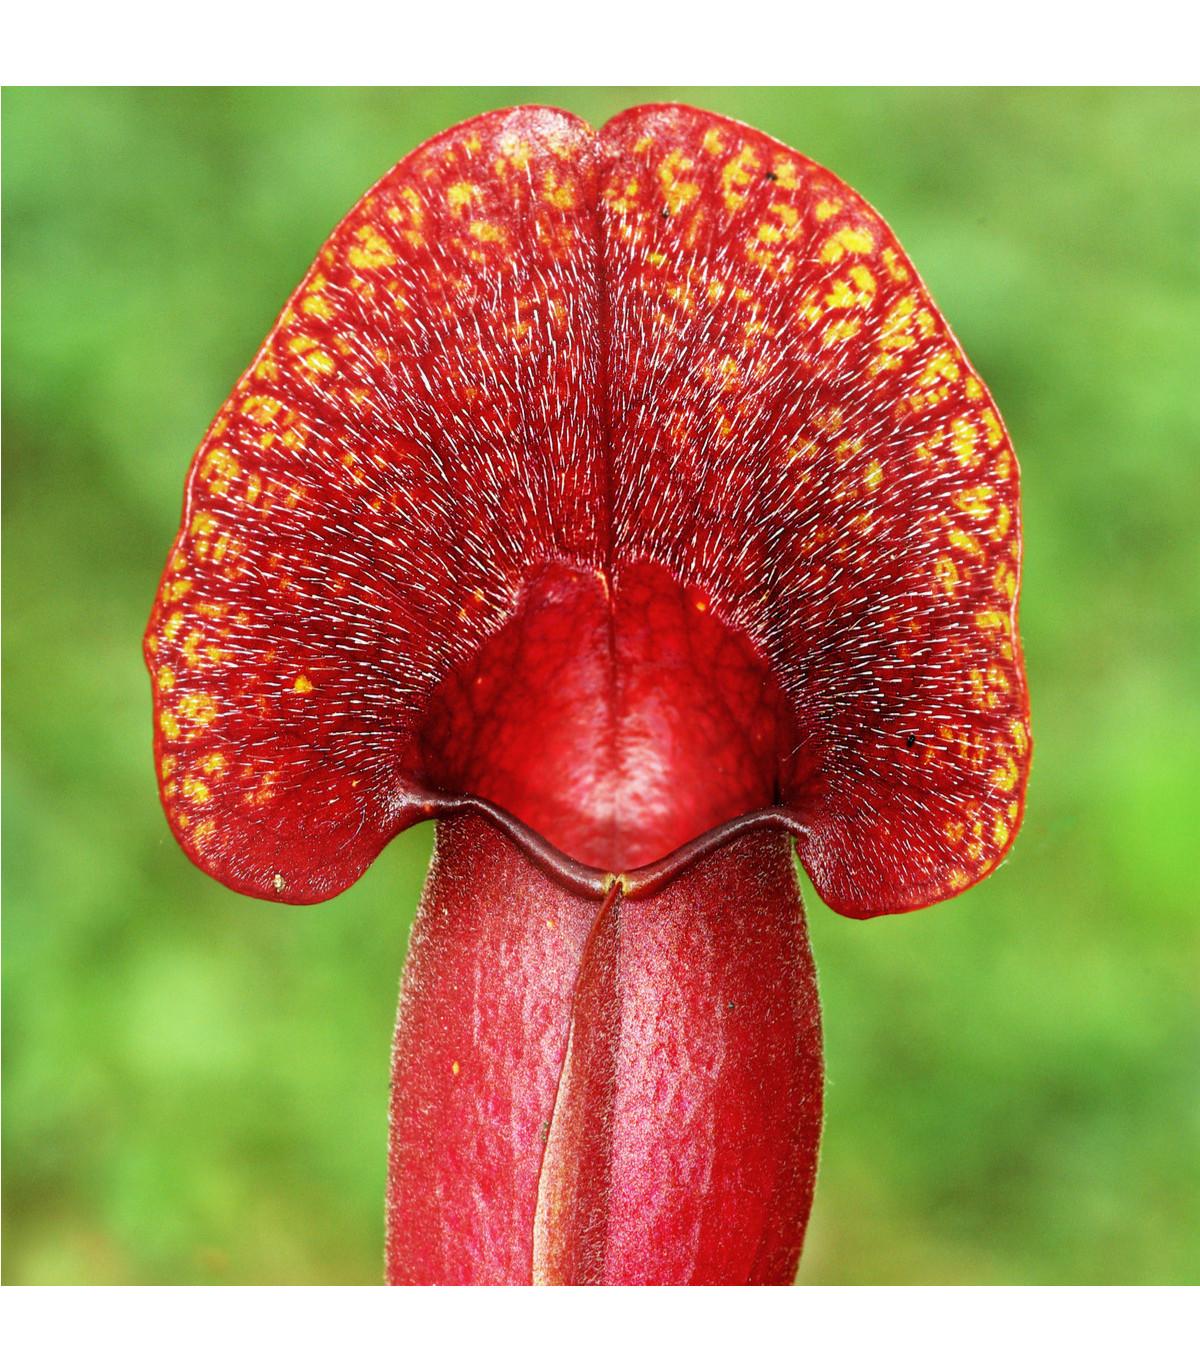 Špirlice nachová extra velká - Sarracenia purpurea - osivo špirlice - 12 ks